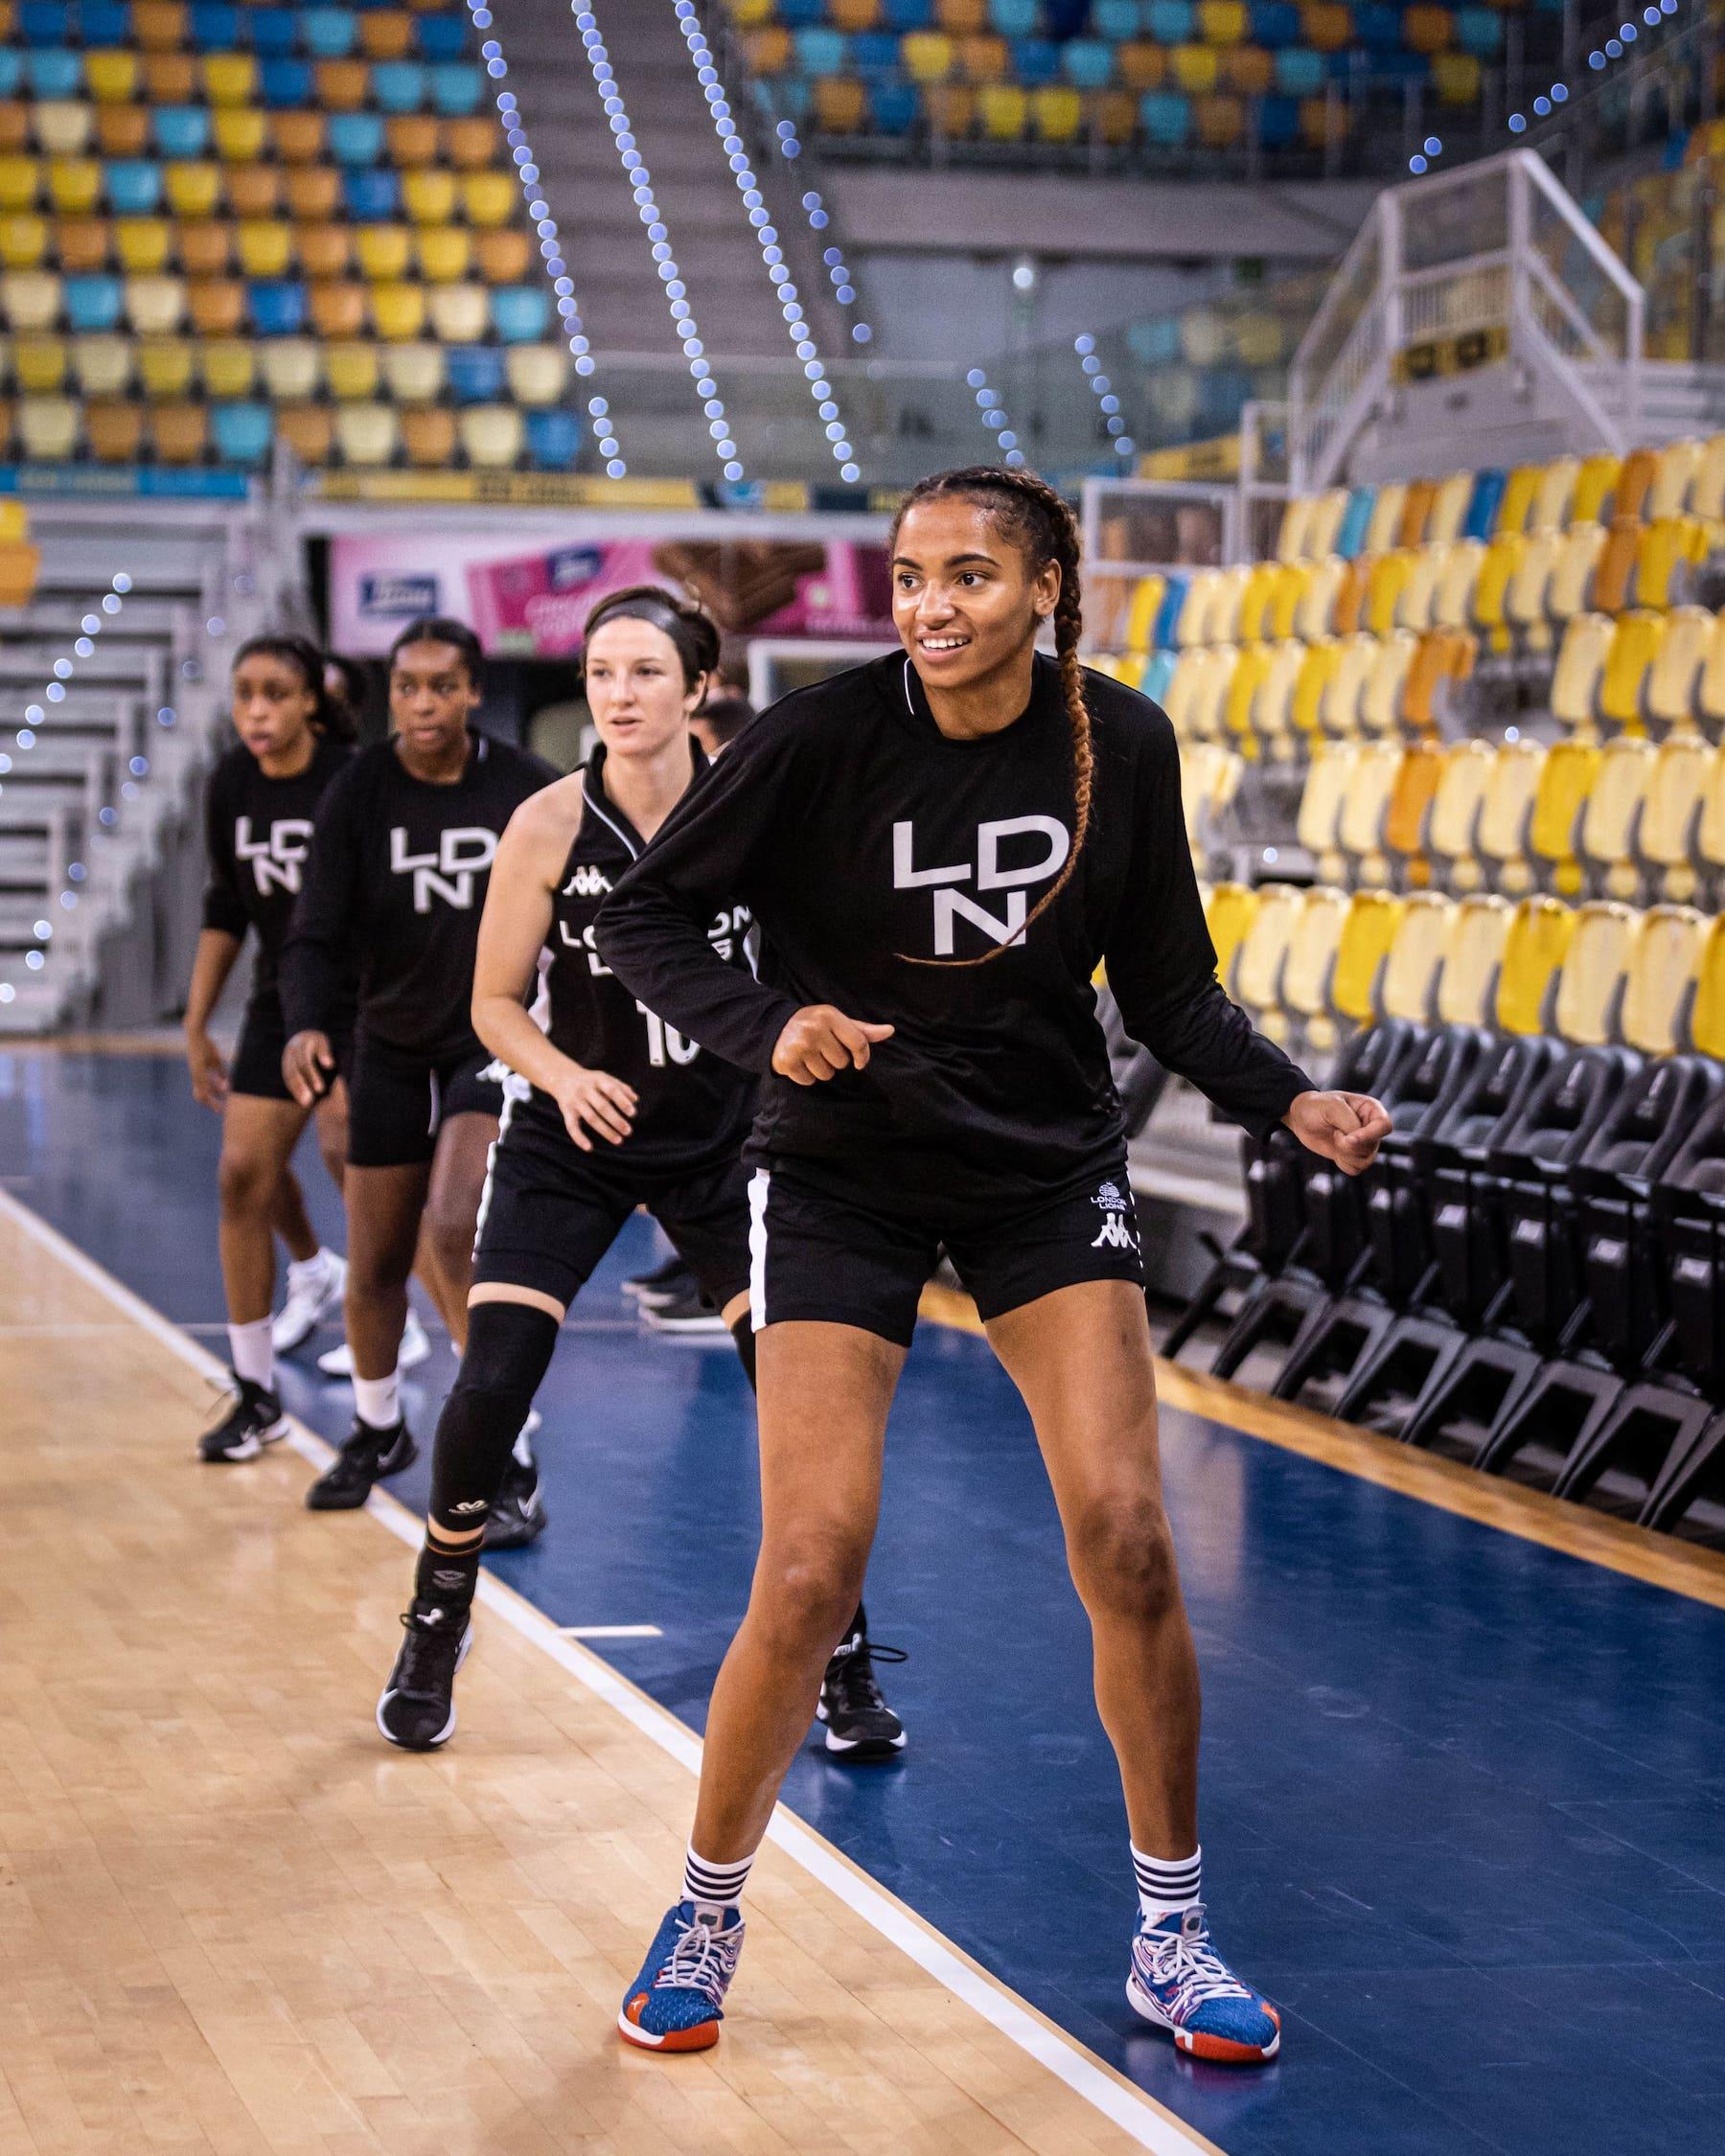 London Lions Women's Team Will be Tested in FIBA EuroCup Regular Season